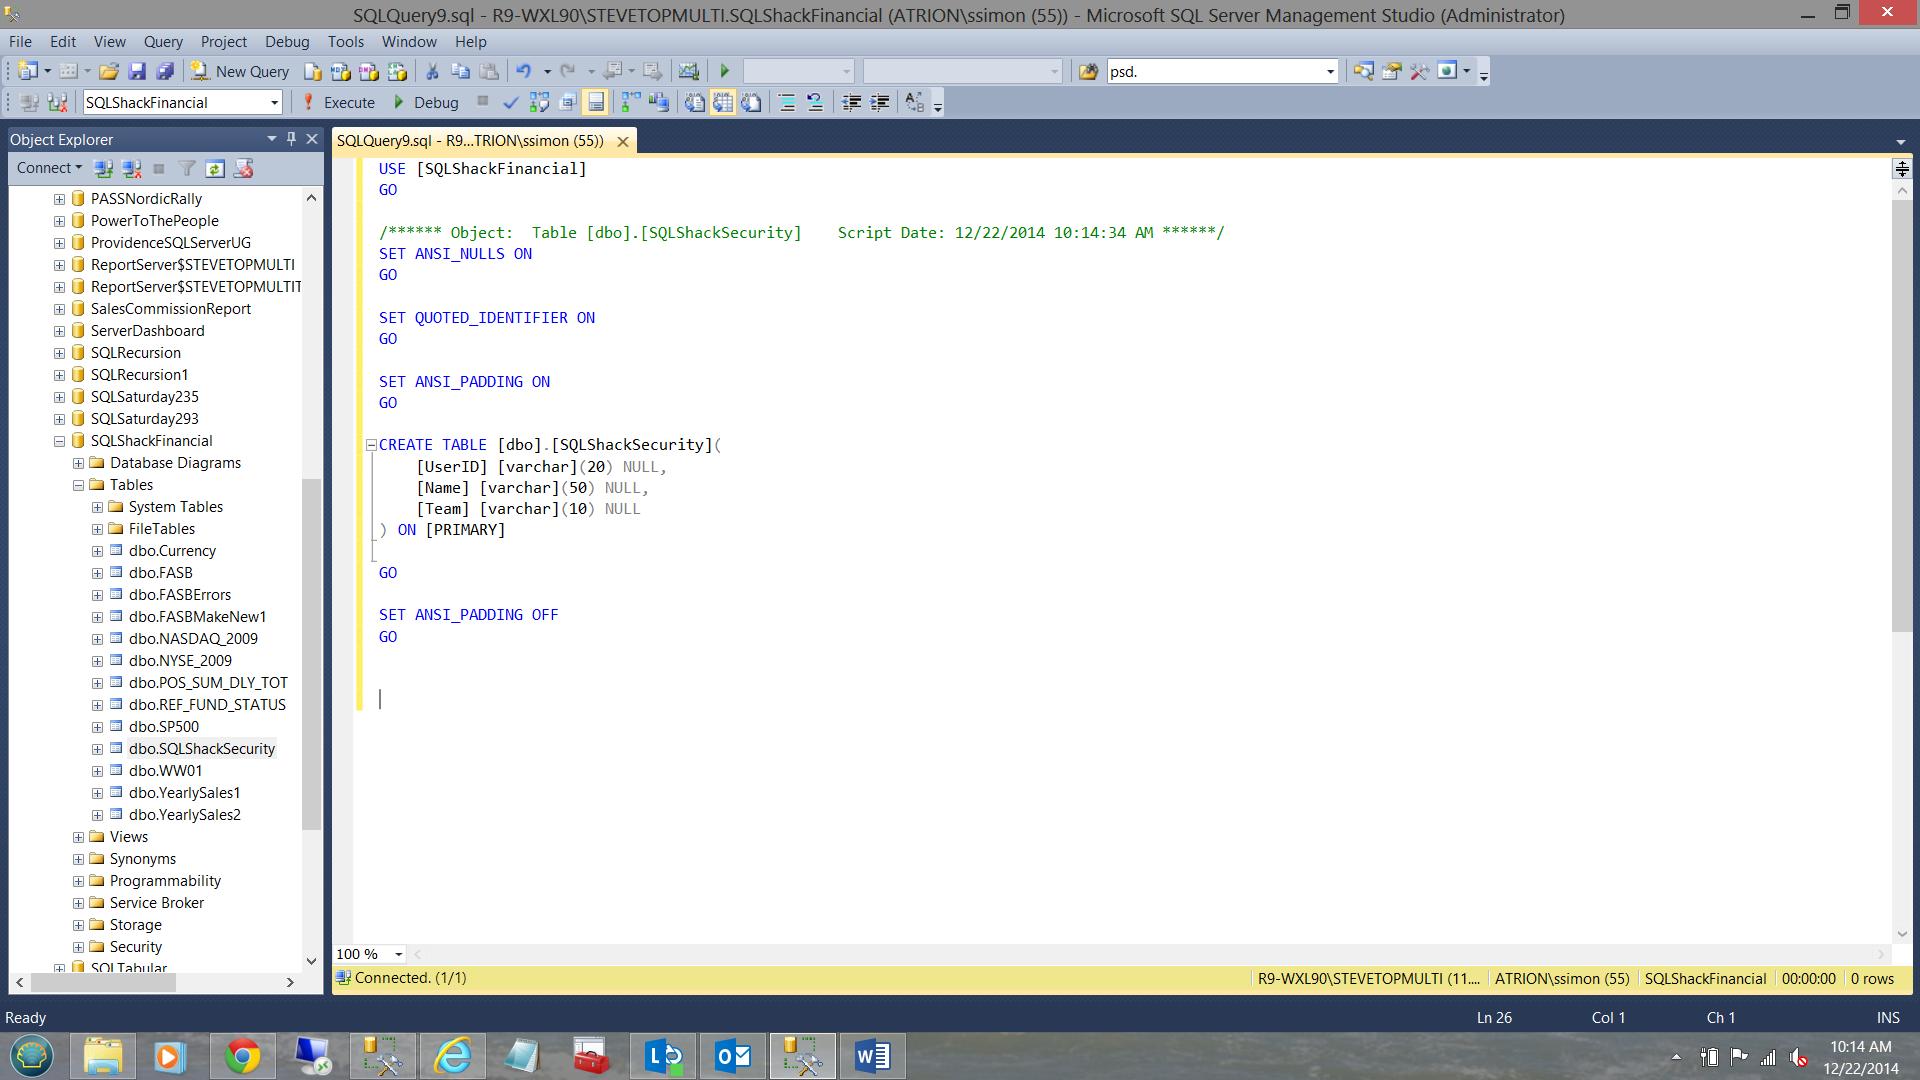 SQL Server安全机制–如何控制用户能够在报告中查看哪些数据2